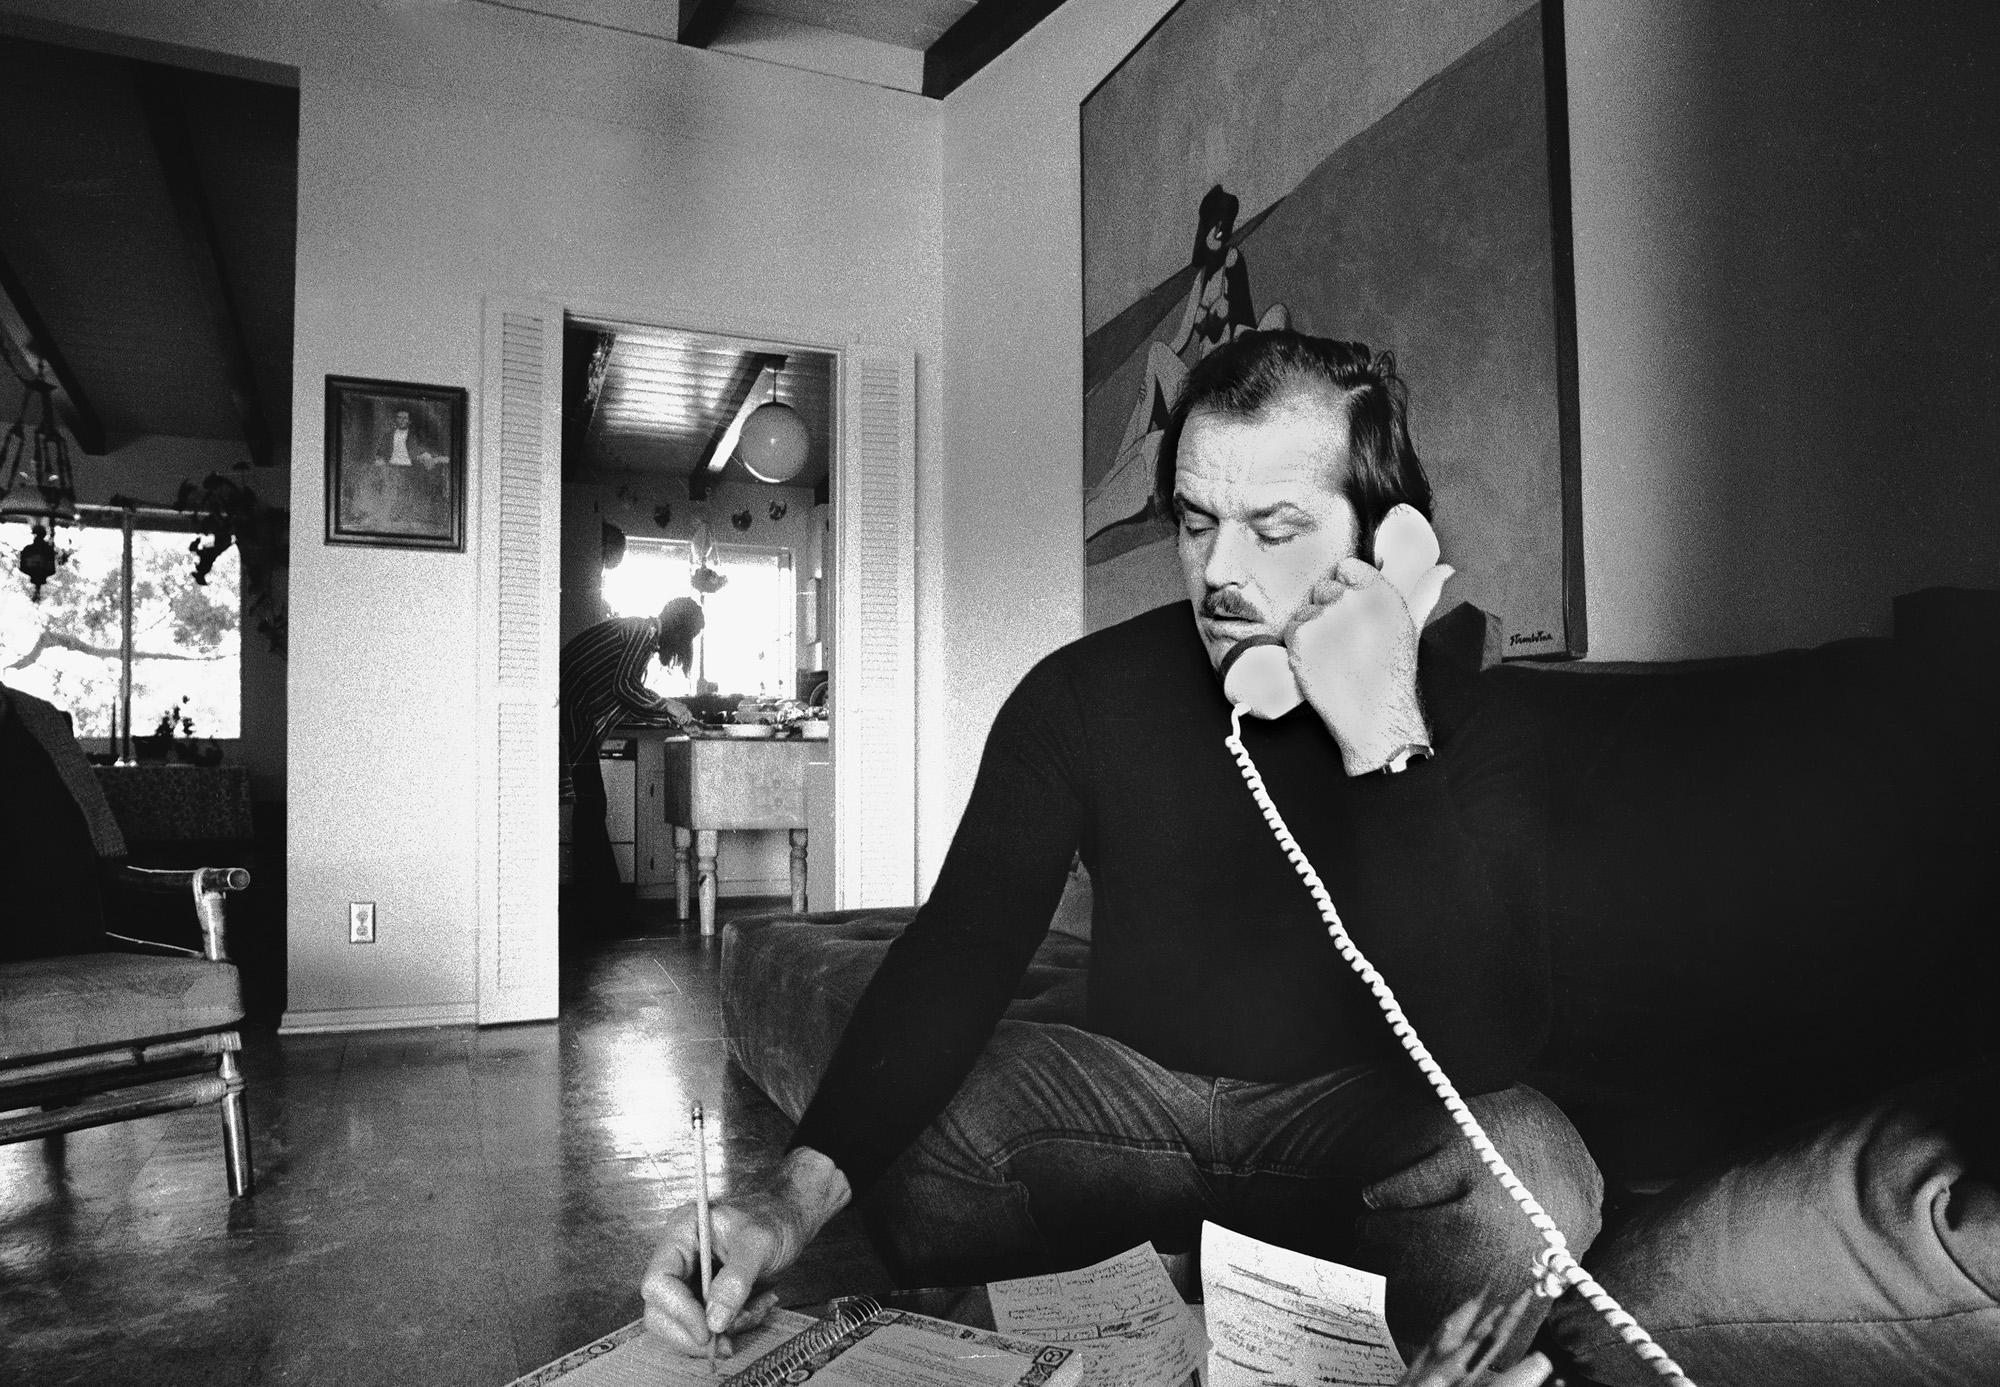 Jack Nicholson at Home, 1975 by Douglas Kirkland